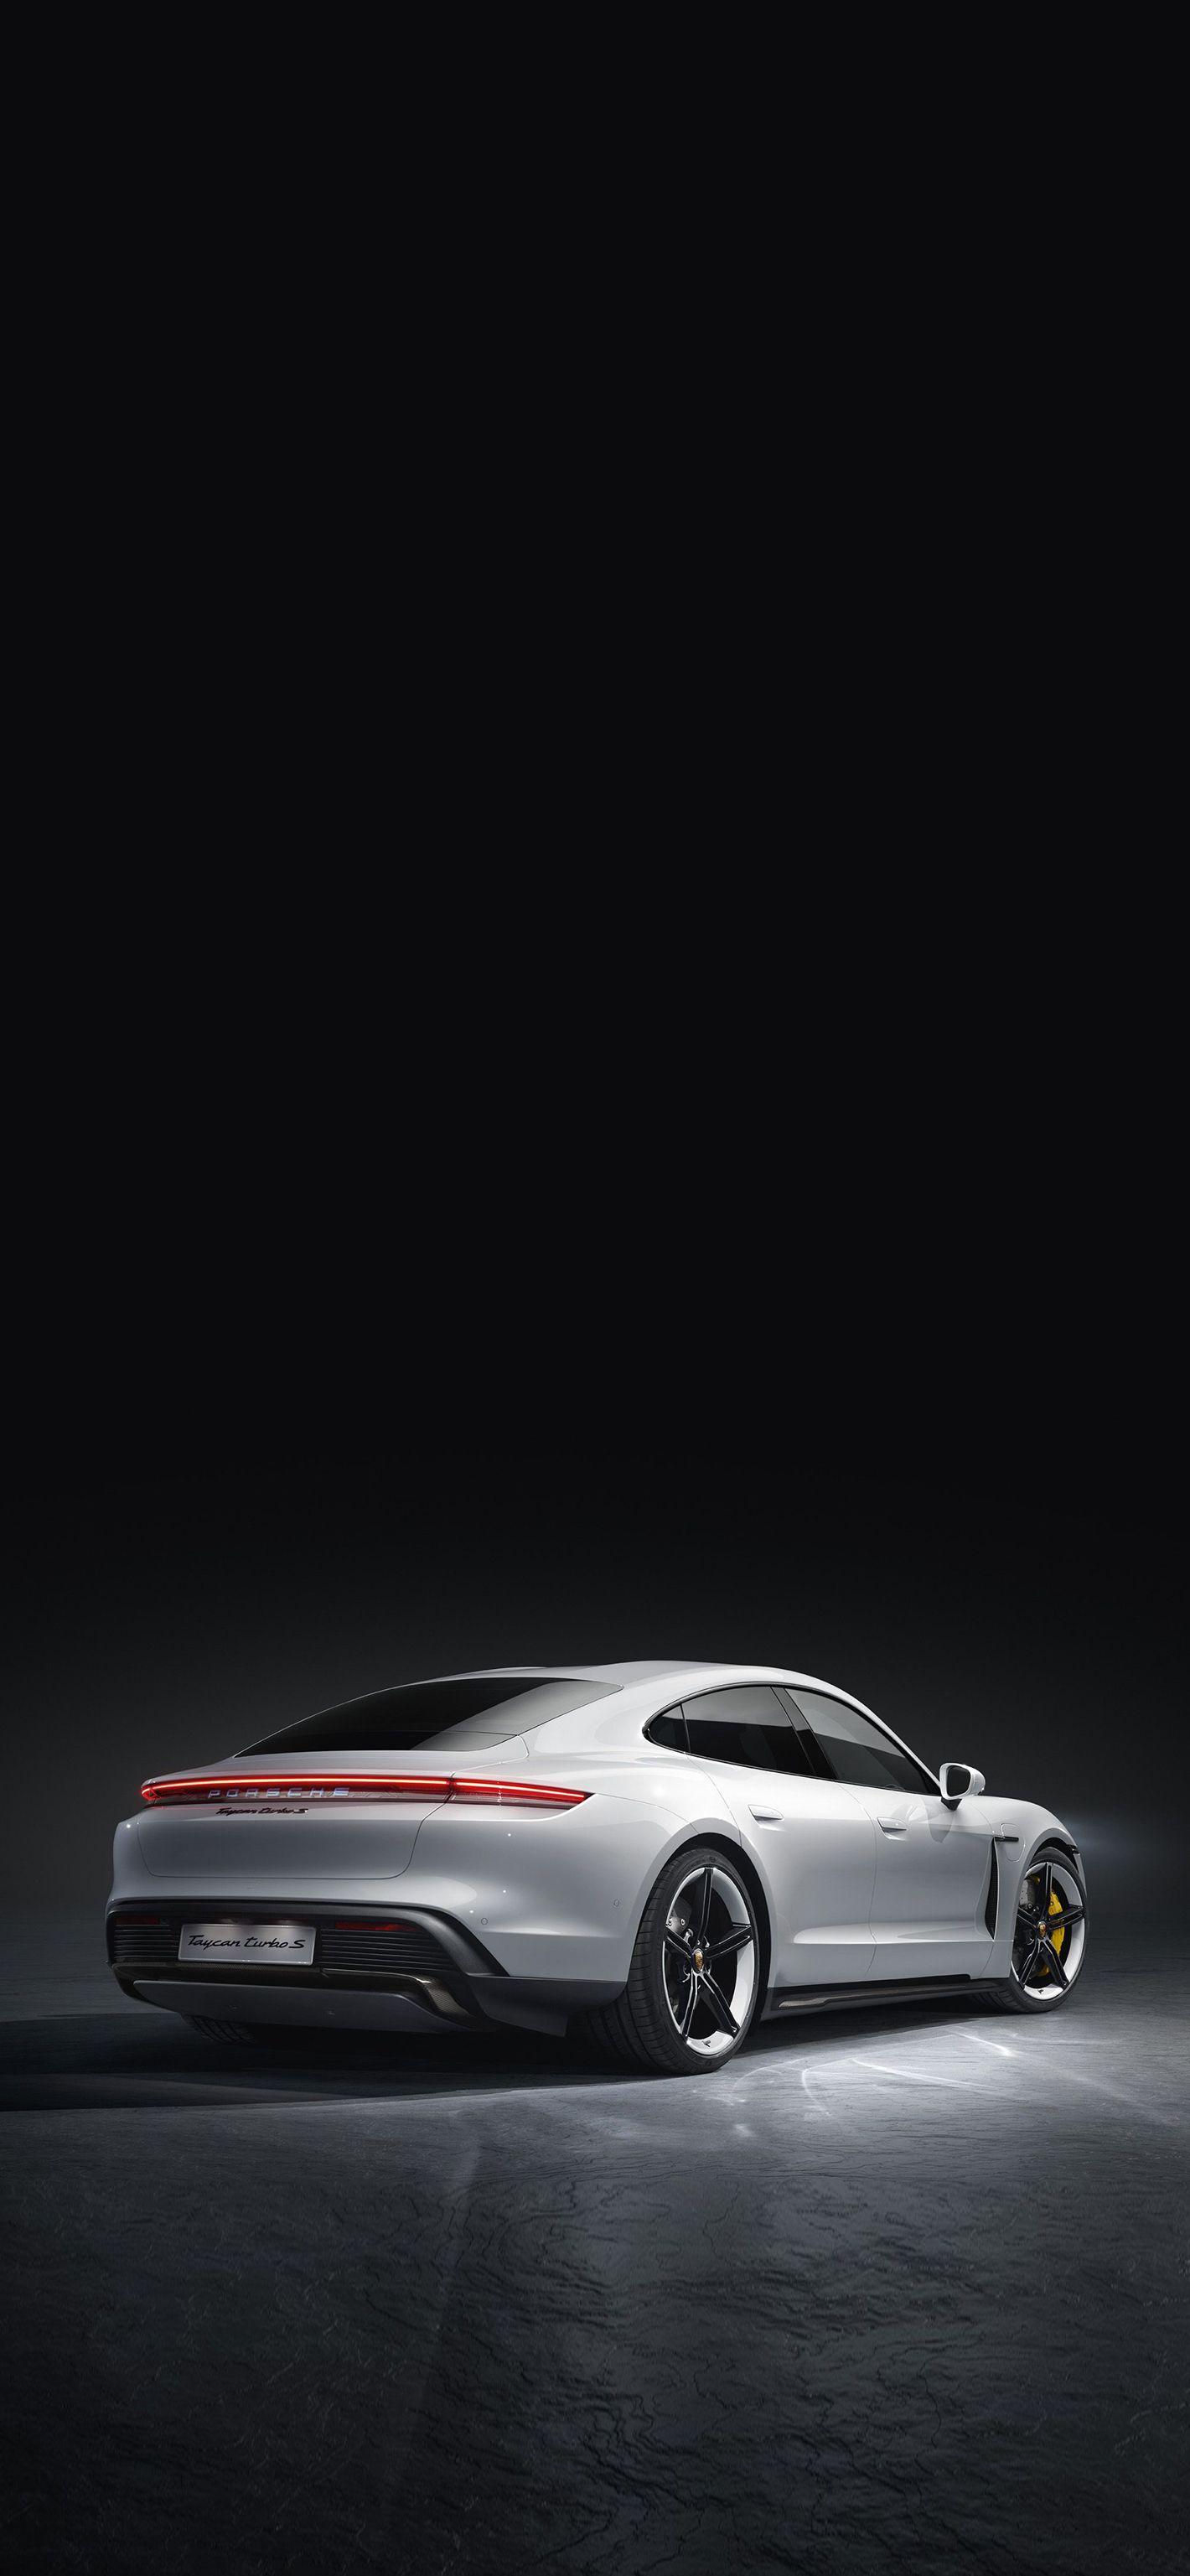 Porsche Taycan Turbo S Porsche Taycan Mercedes Wallpaper Porsche Iphone Wallpaper